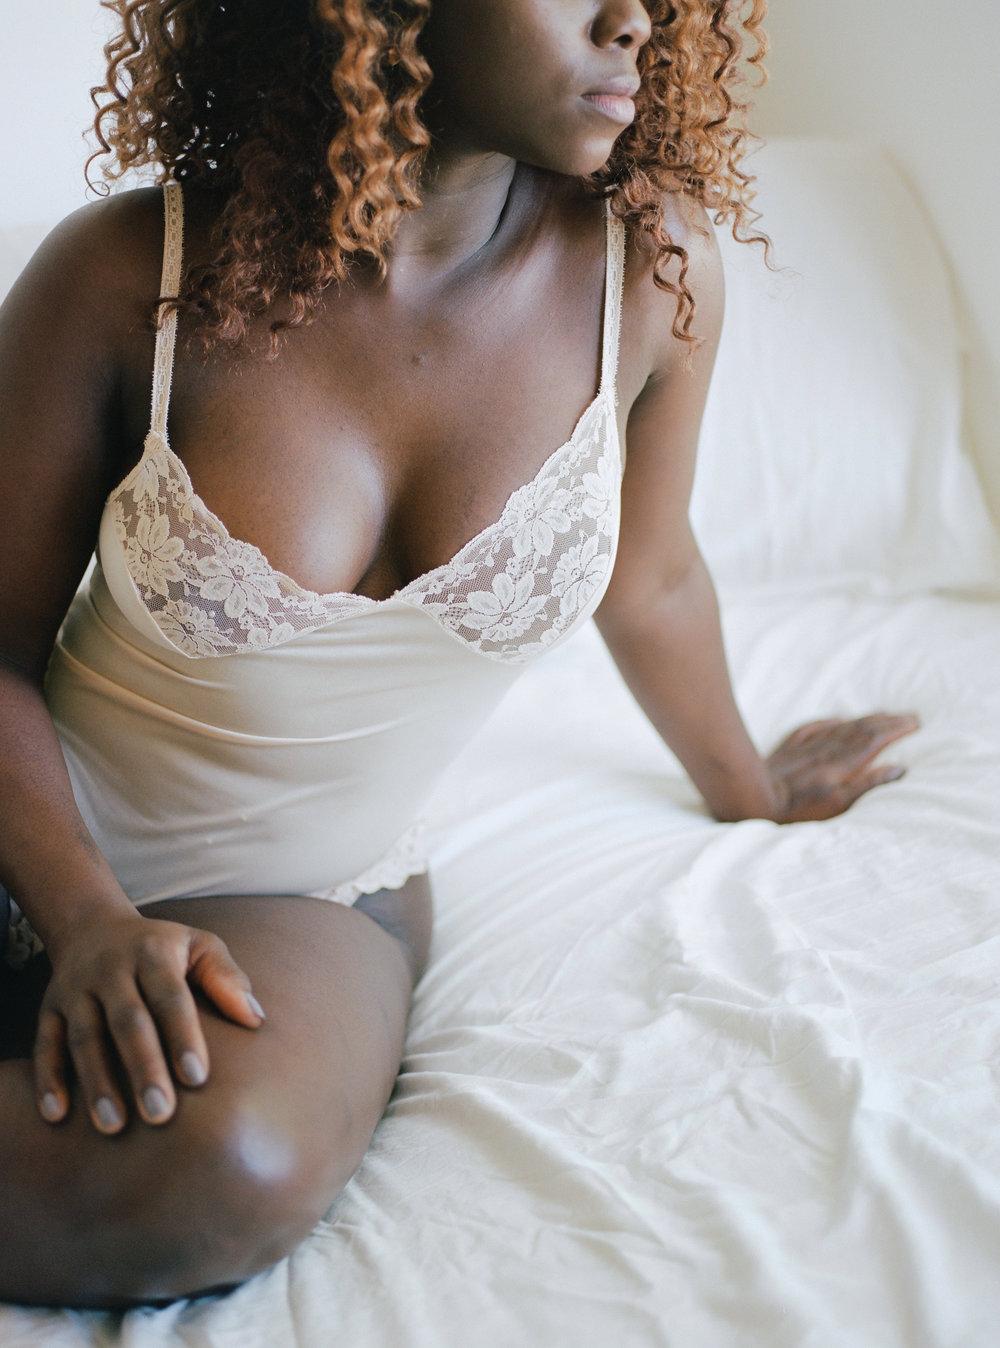 Miami Boudoir Photographer Munaluchi Bride, Denice Lachapelle Photography